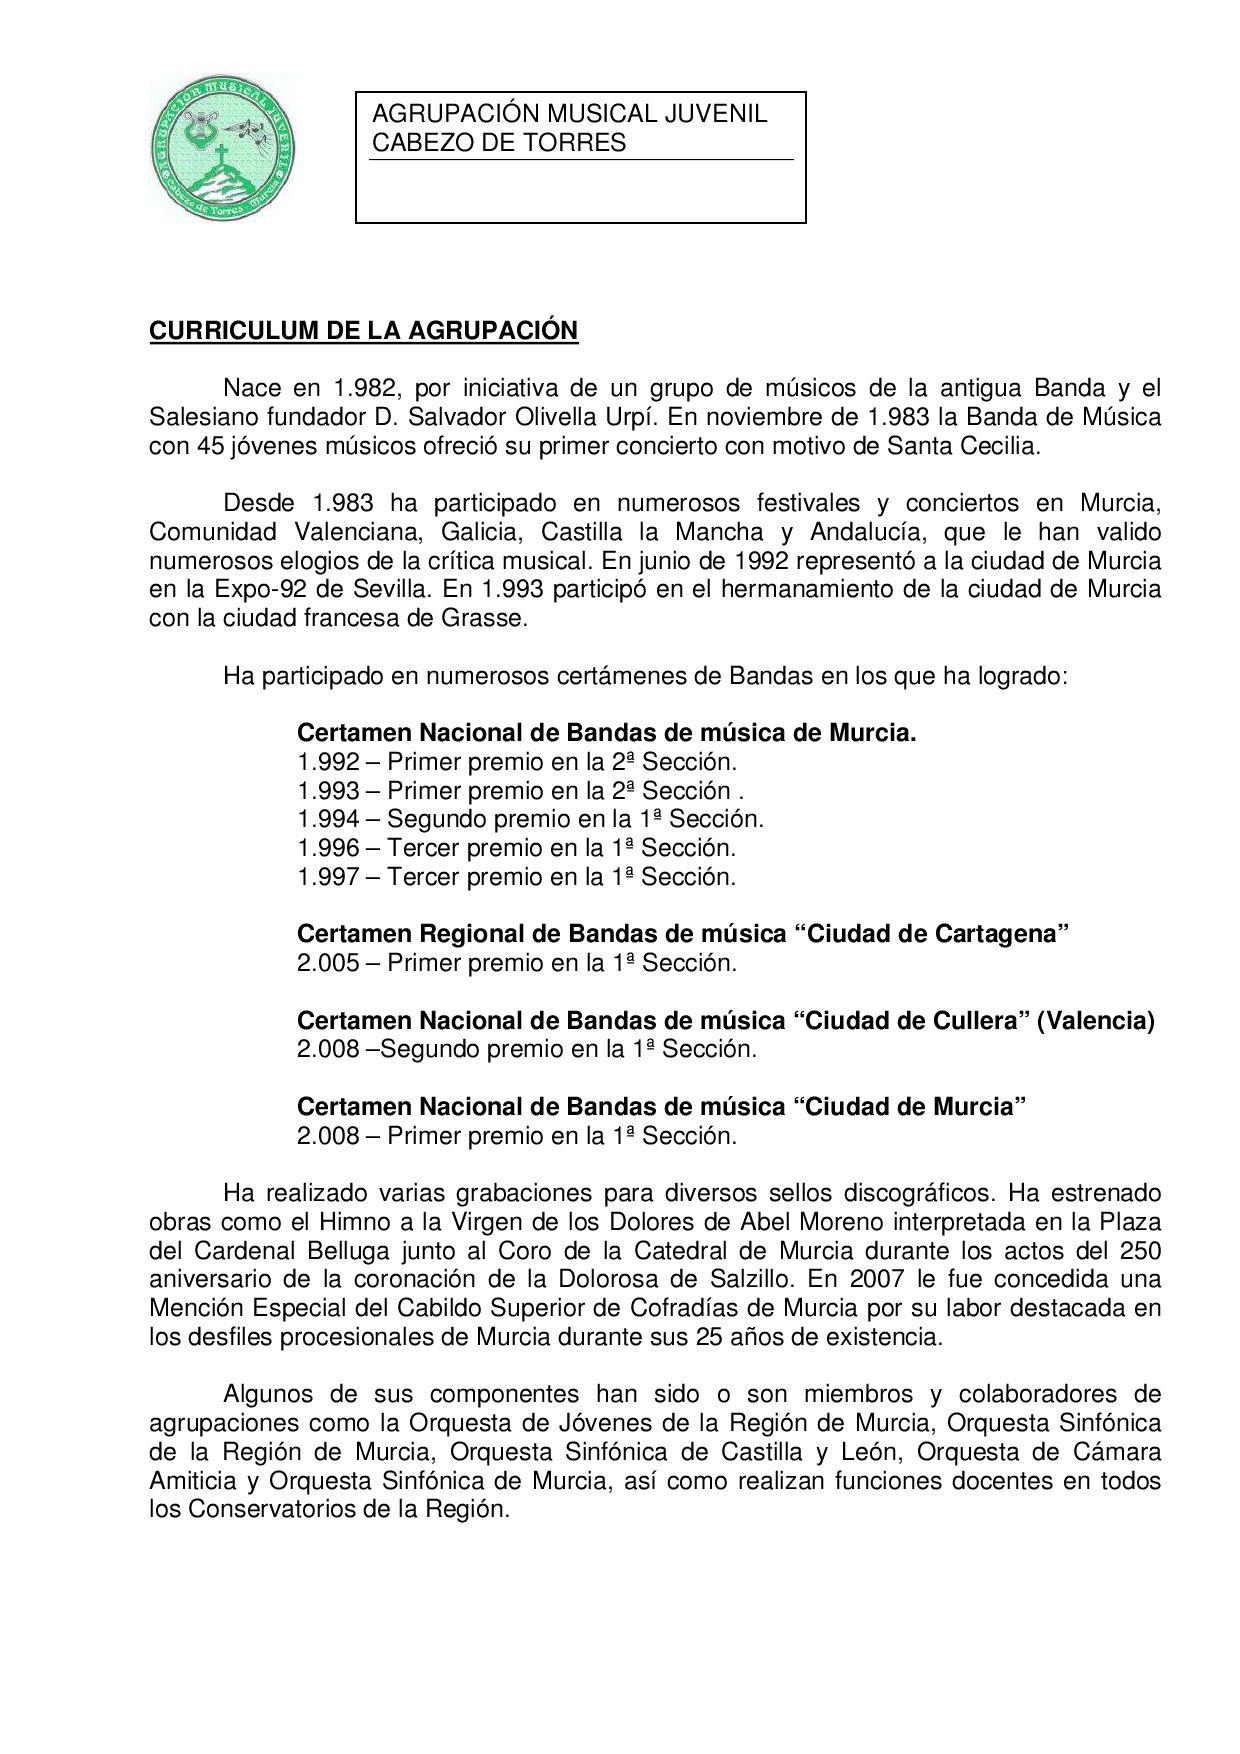 Curriculum Banda de Música by Agrupacion Musical - issuu